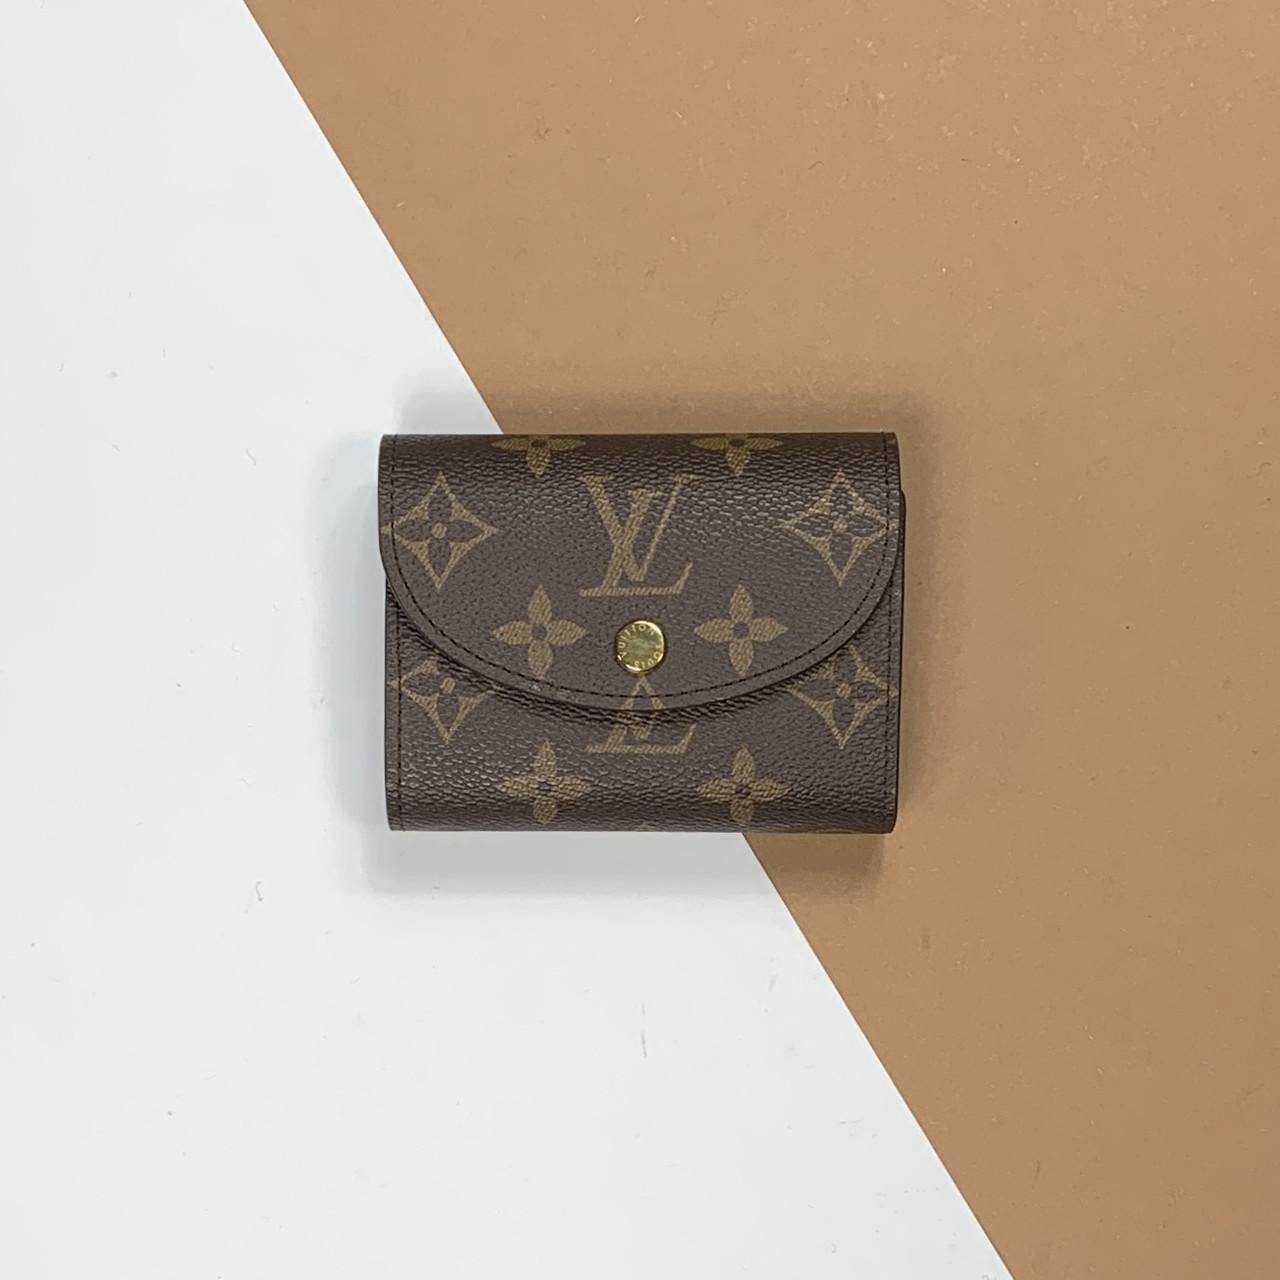 Кошелек Louis Vuitton VICTORINE (Луи Виттон) арт. 22-19